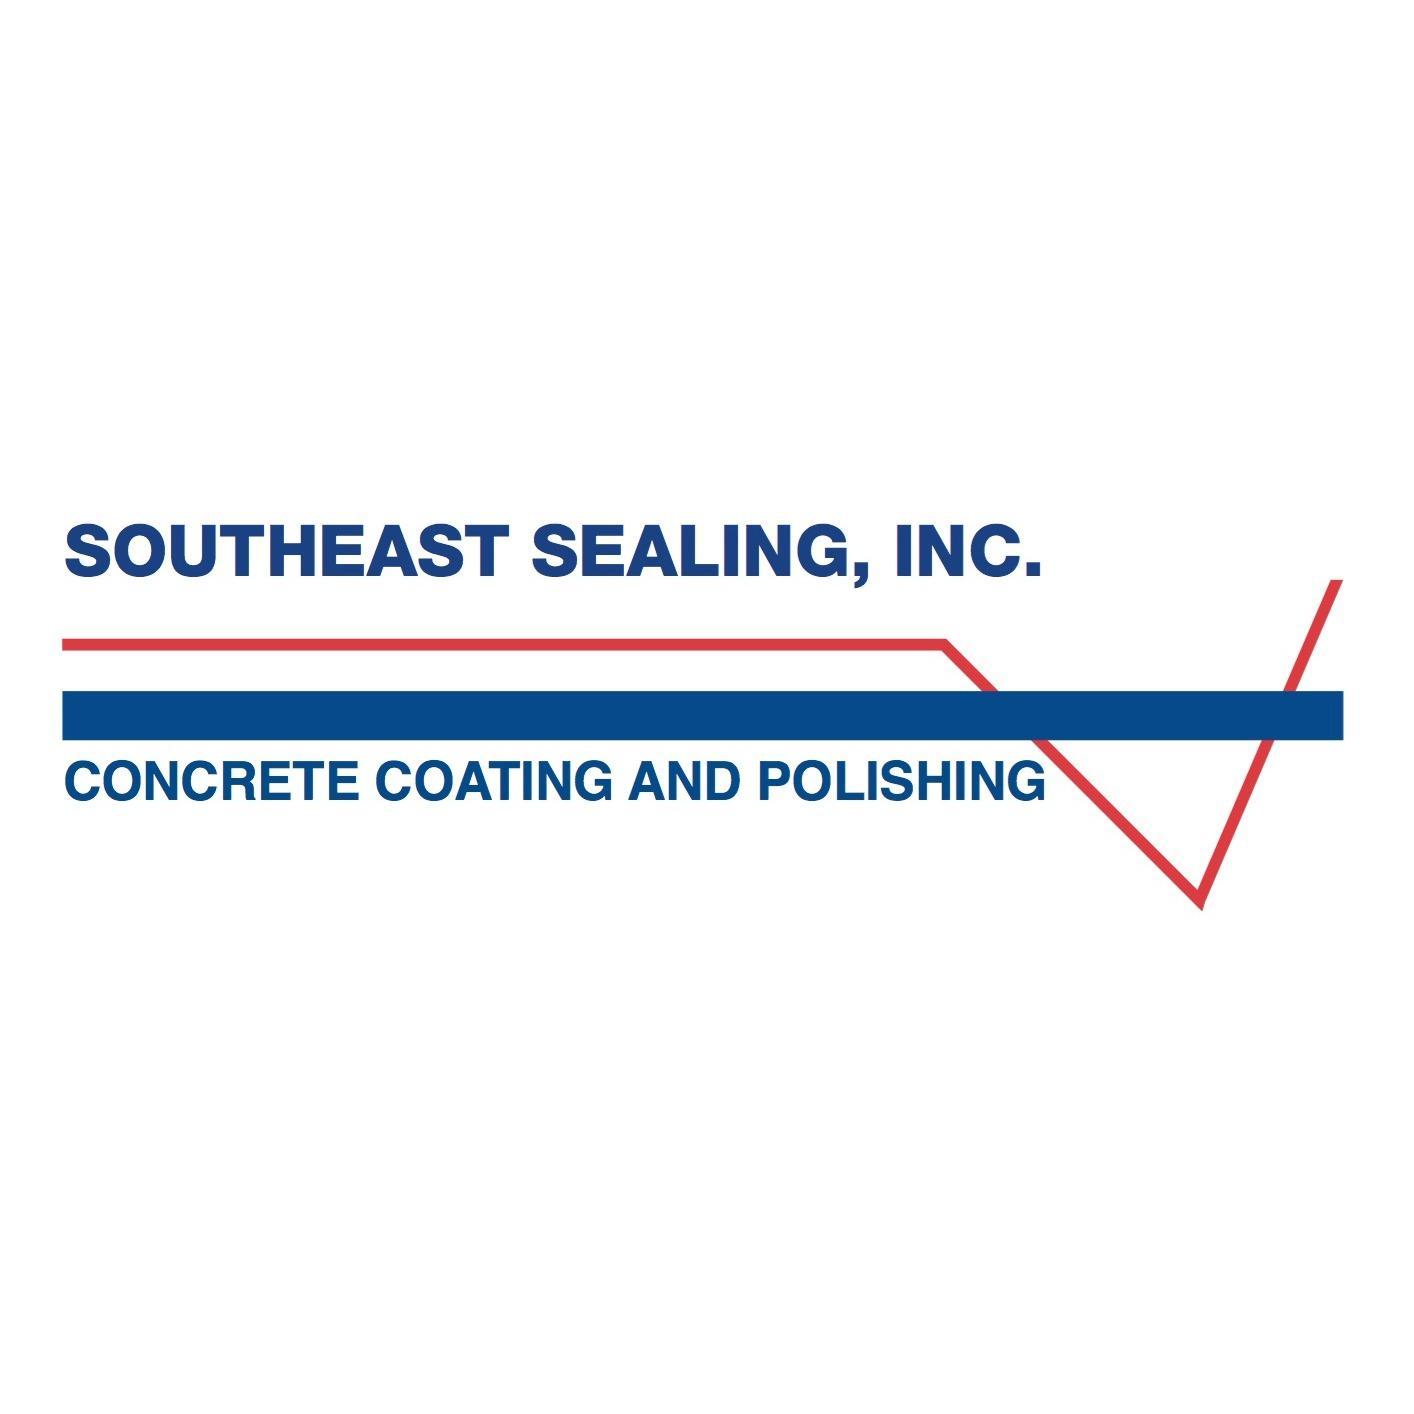 Southeast Sealing, Inc.